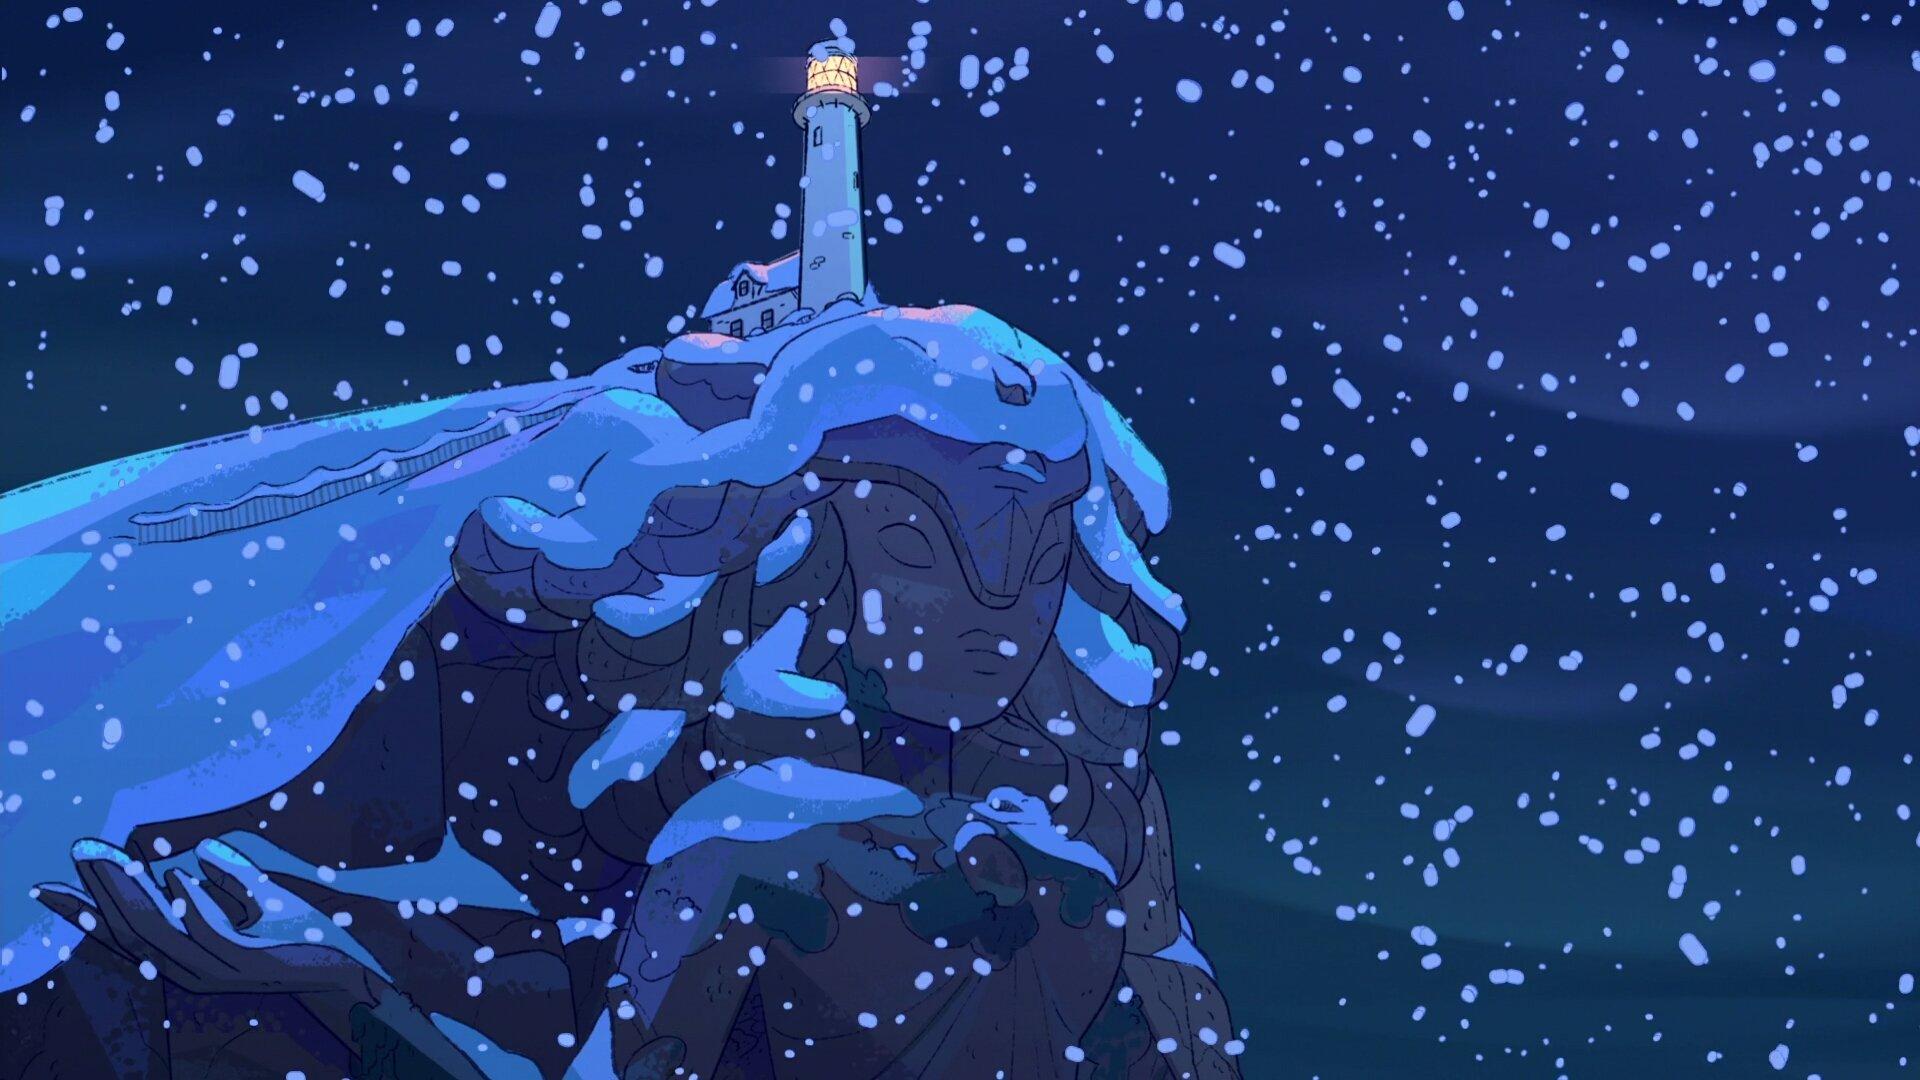 General 1920x1080 Steven Universe Steven Universe (TV Show) snow lighthouse cartoon blue night snowing